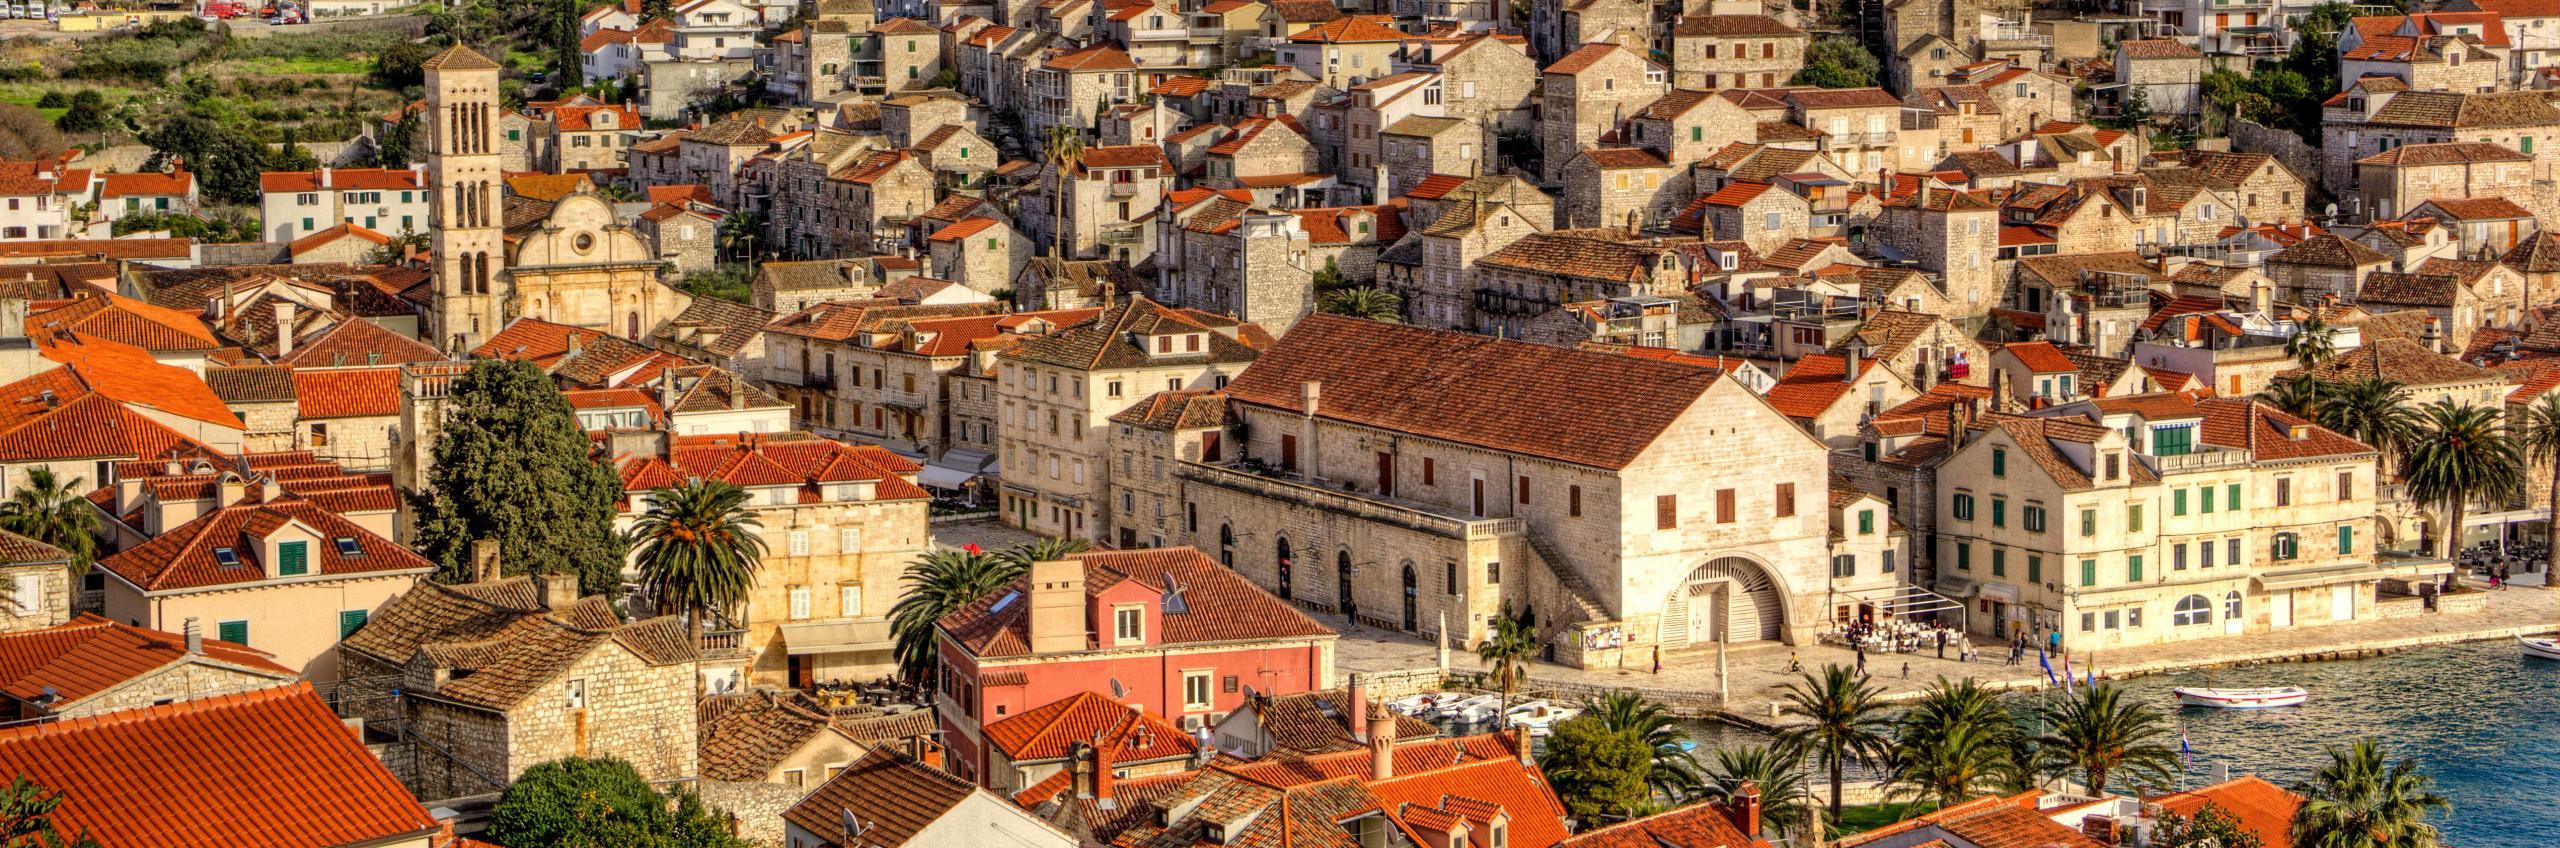 Beautiful surroundings and rich history